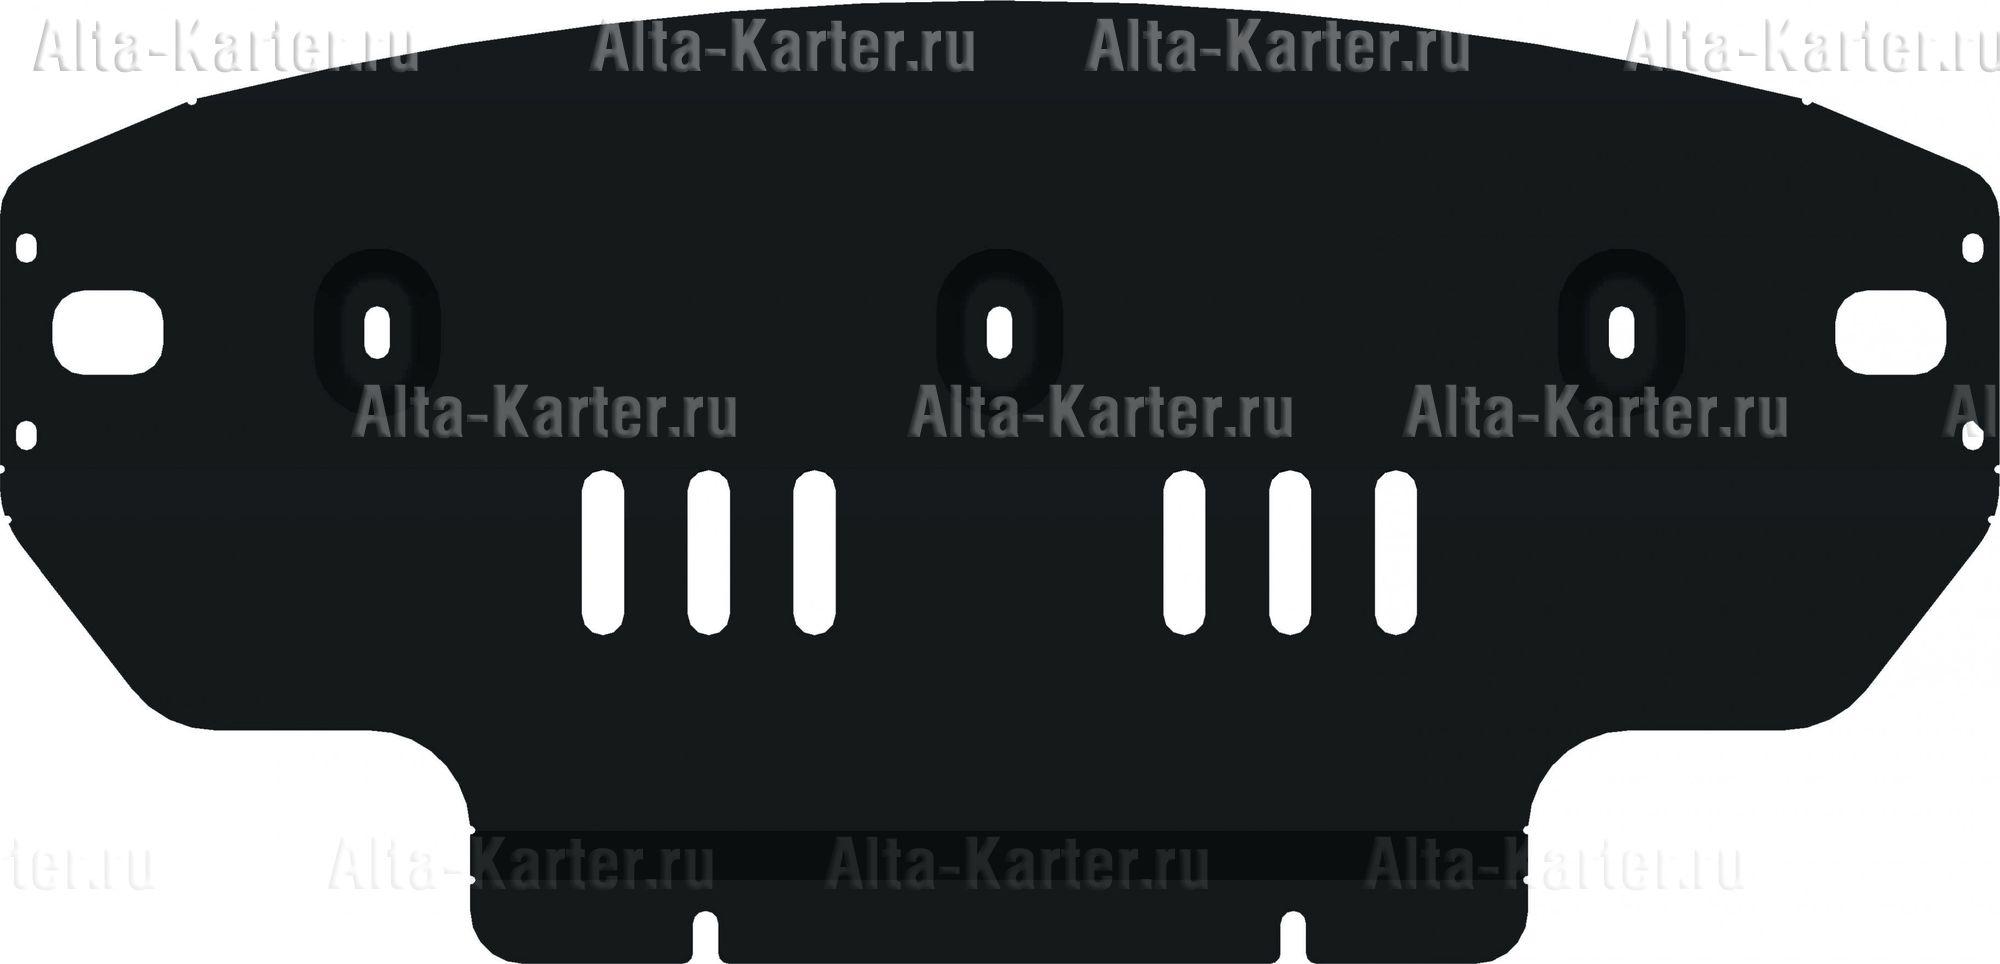 Защита Alfeco для картера Volkswagen Crafter I рестайлинг 2011-2016. Артикул ALF.26.36